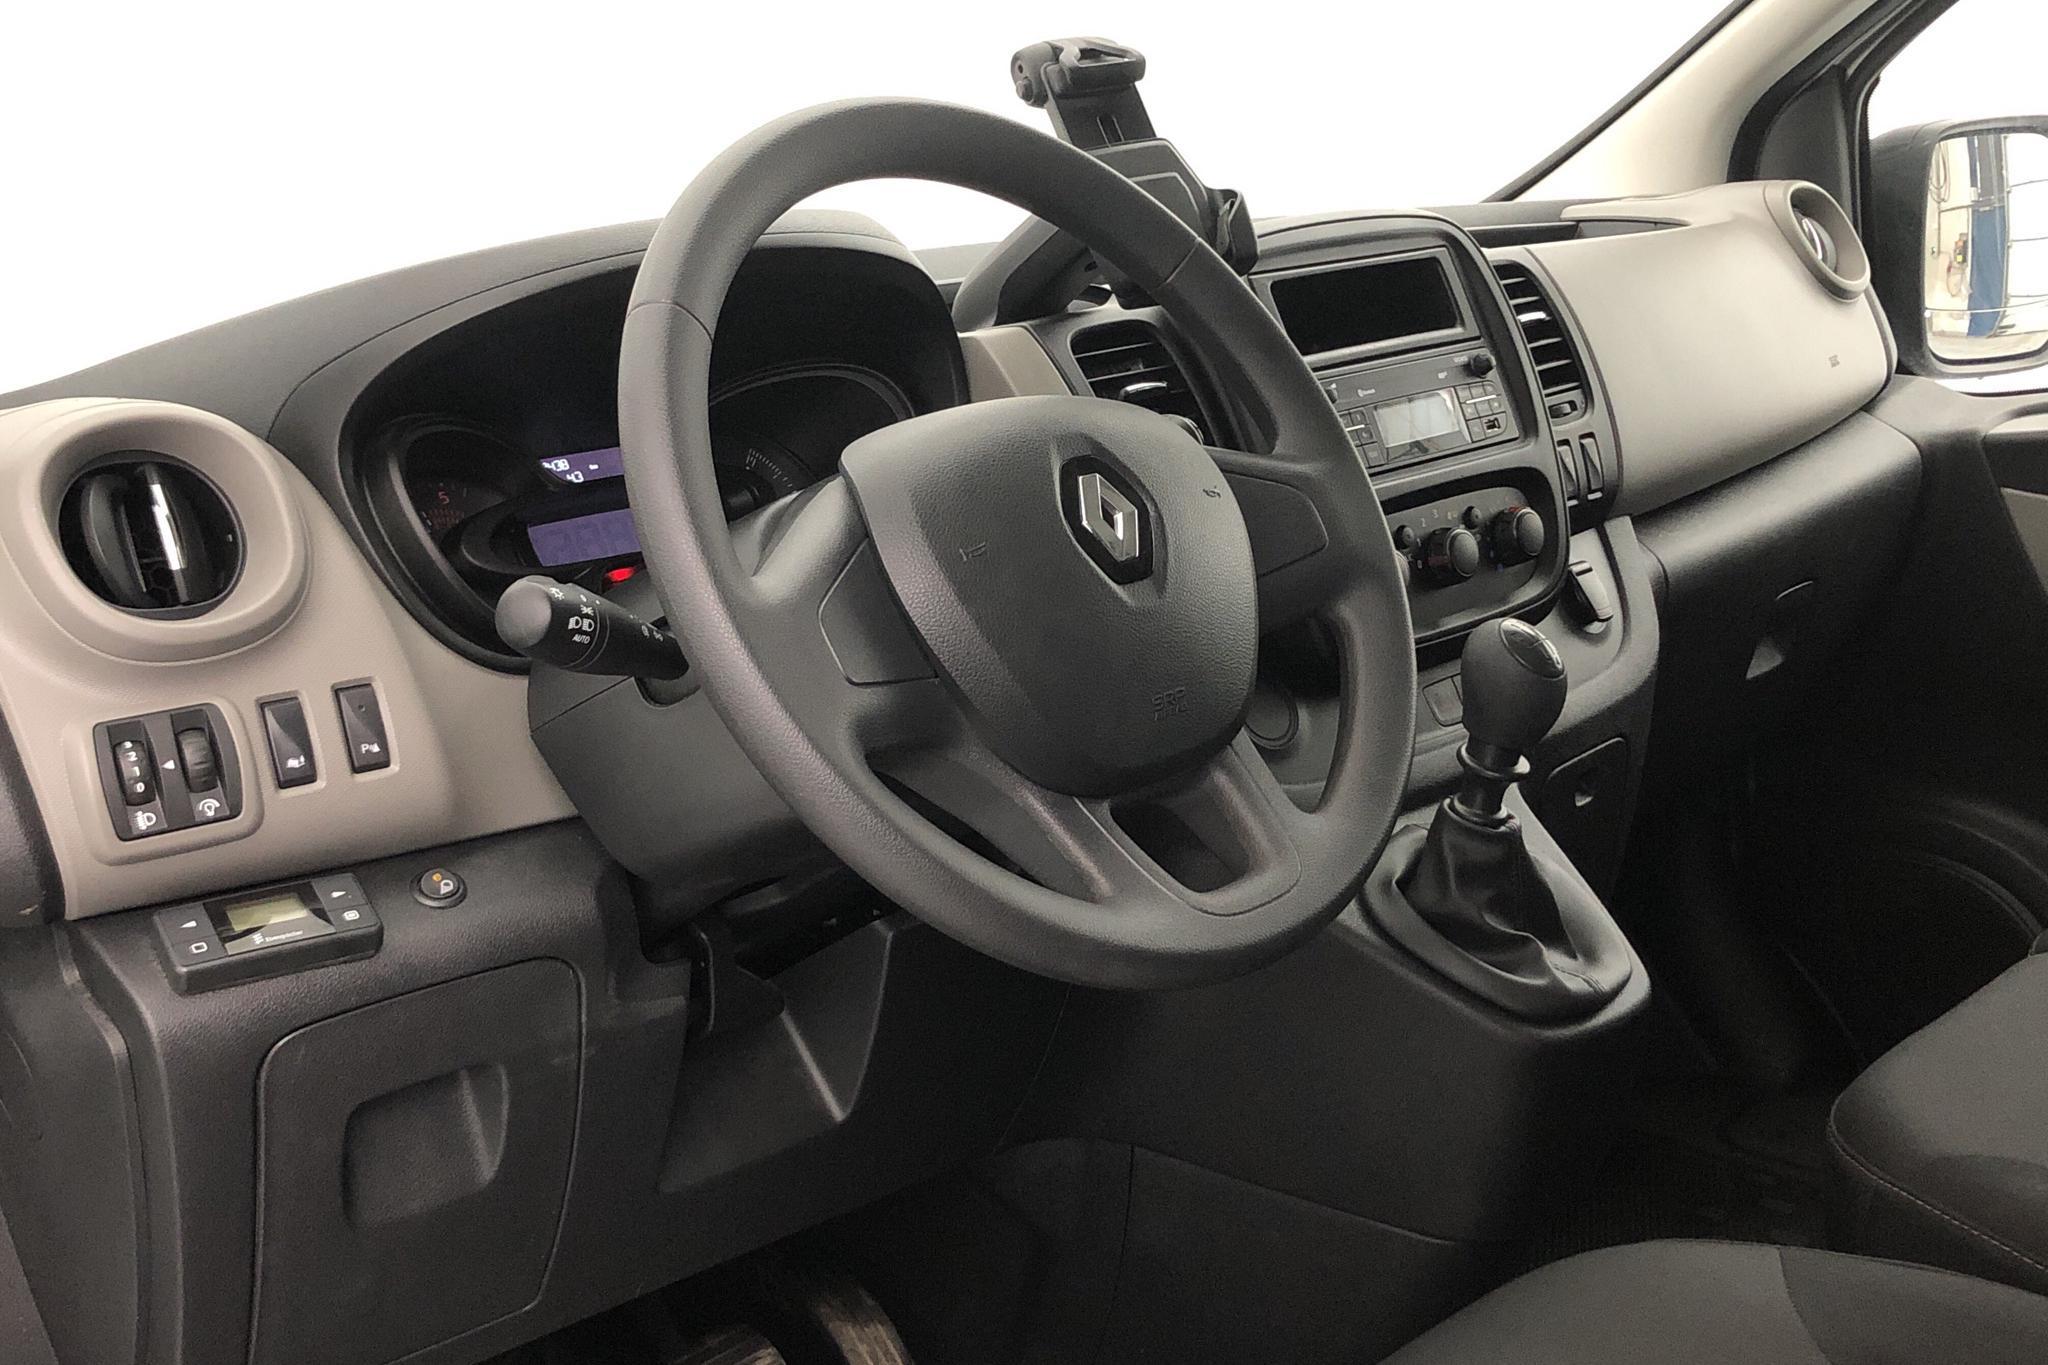 Renault Trafic 1.6 dCi Passenger (125hk) - 11 943 mil - Manuell - silver - 2017